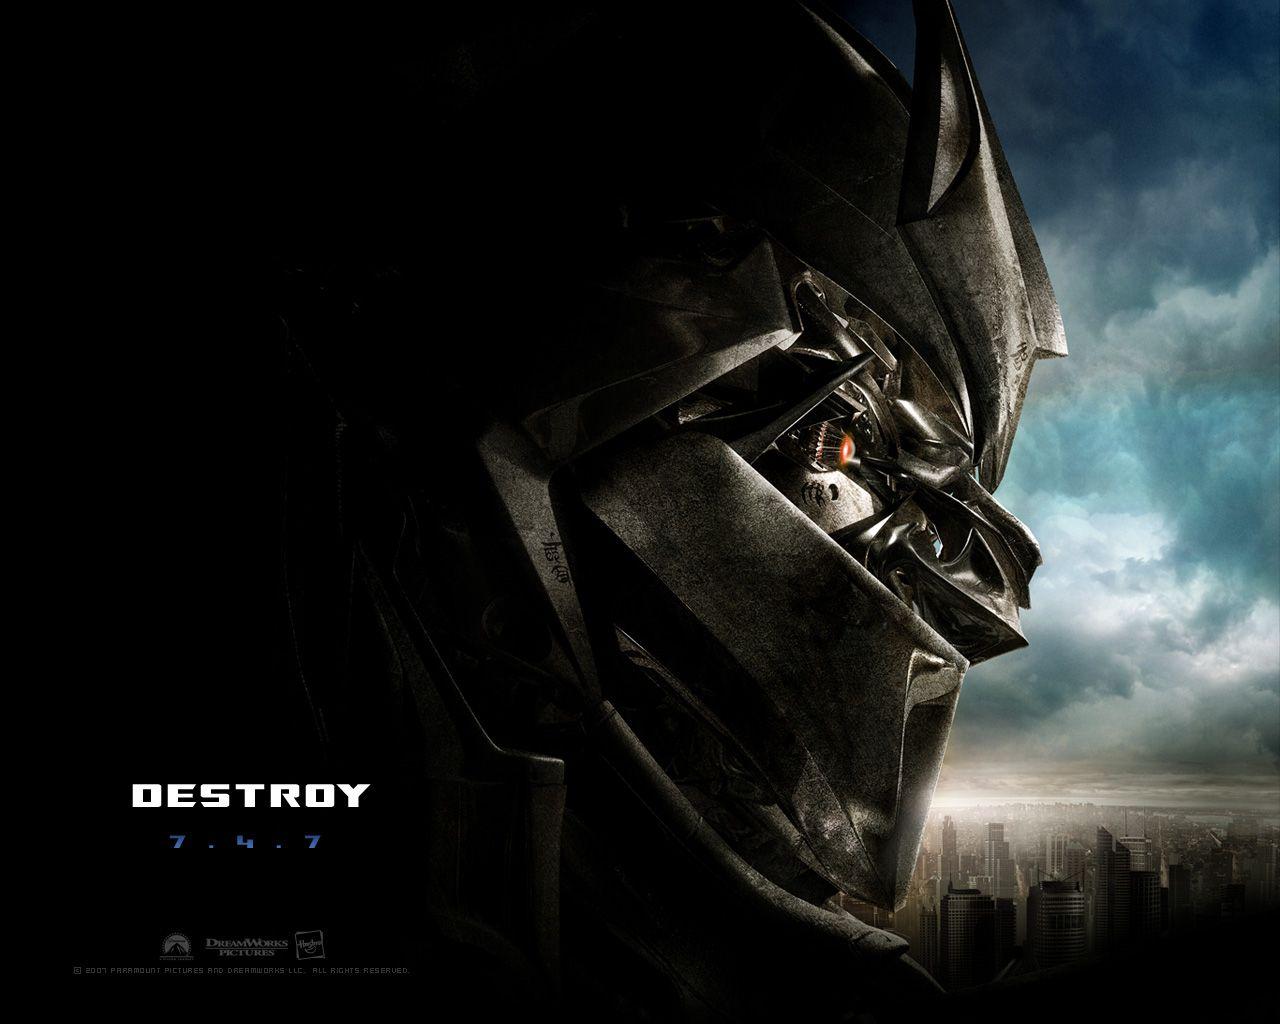 Transformers Wallpaper: Transformers Movie: Megatron